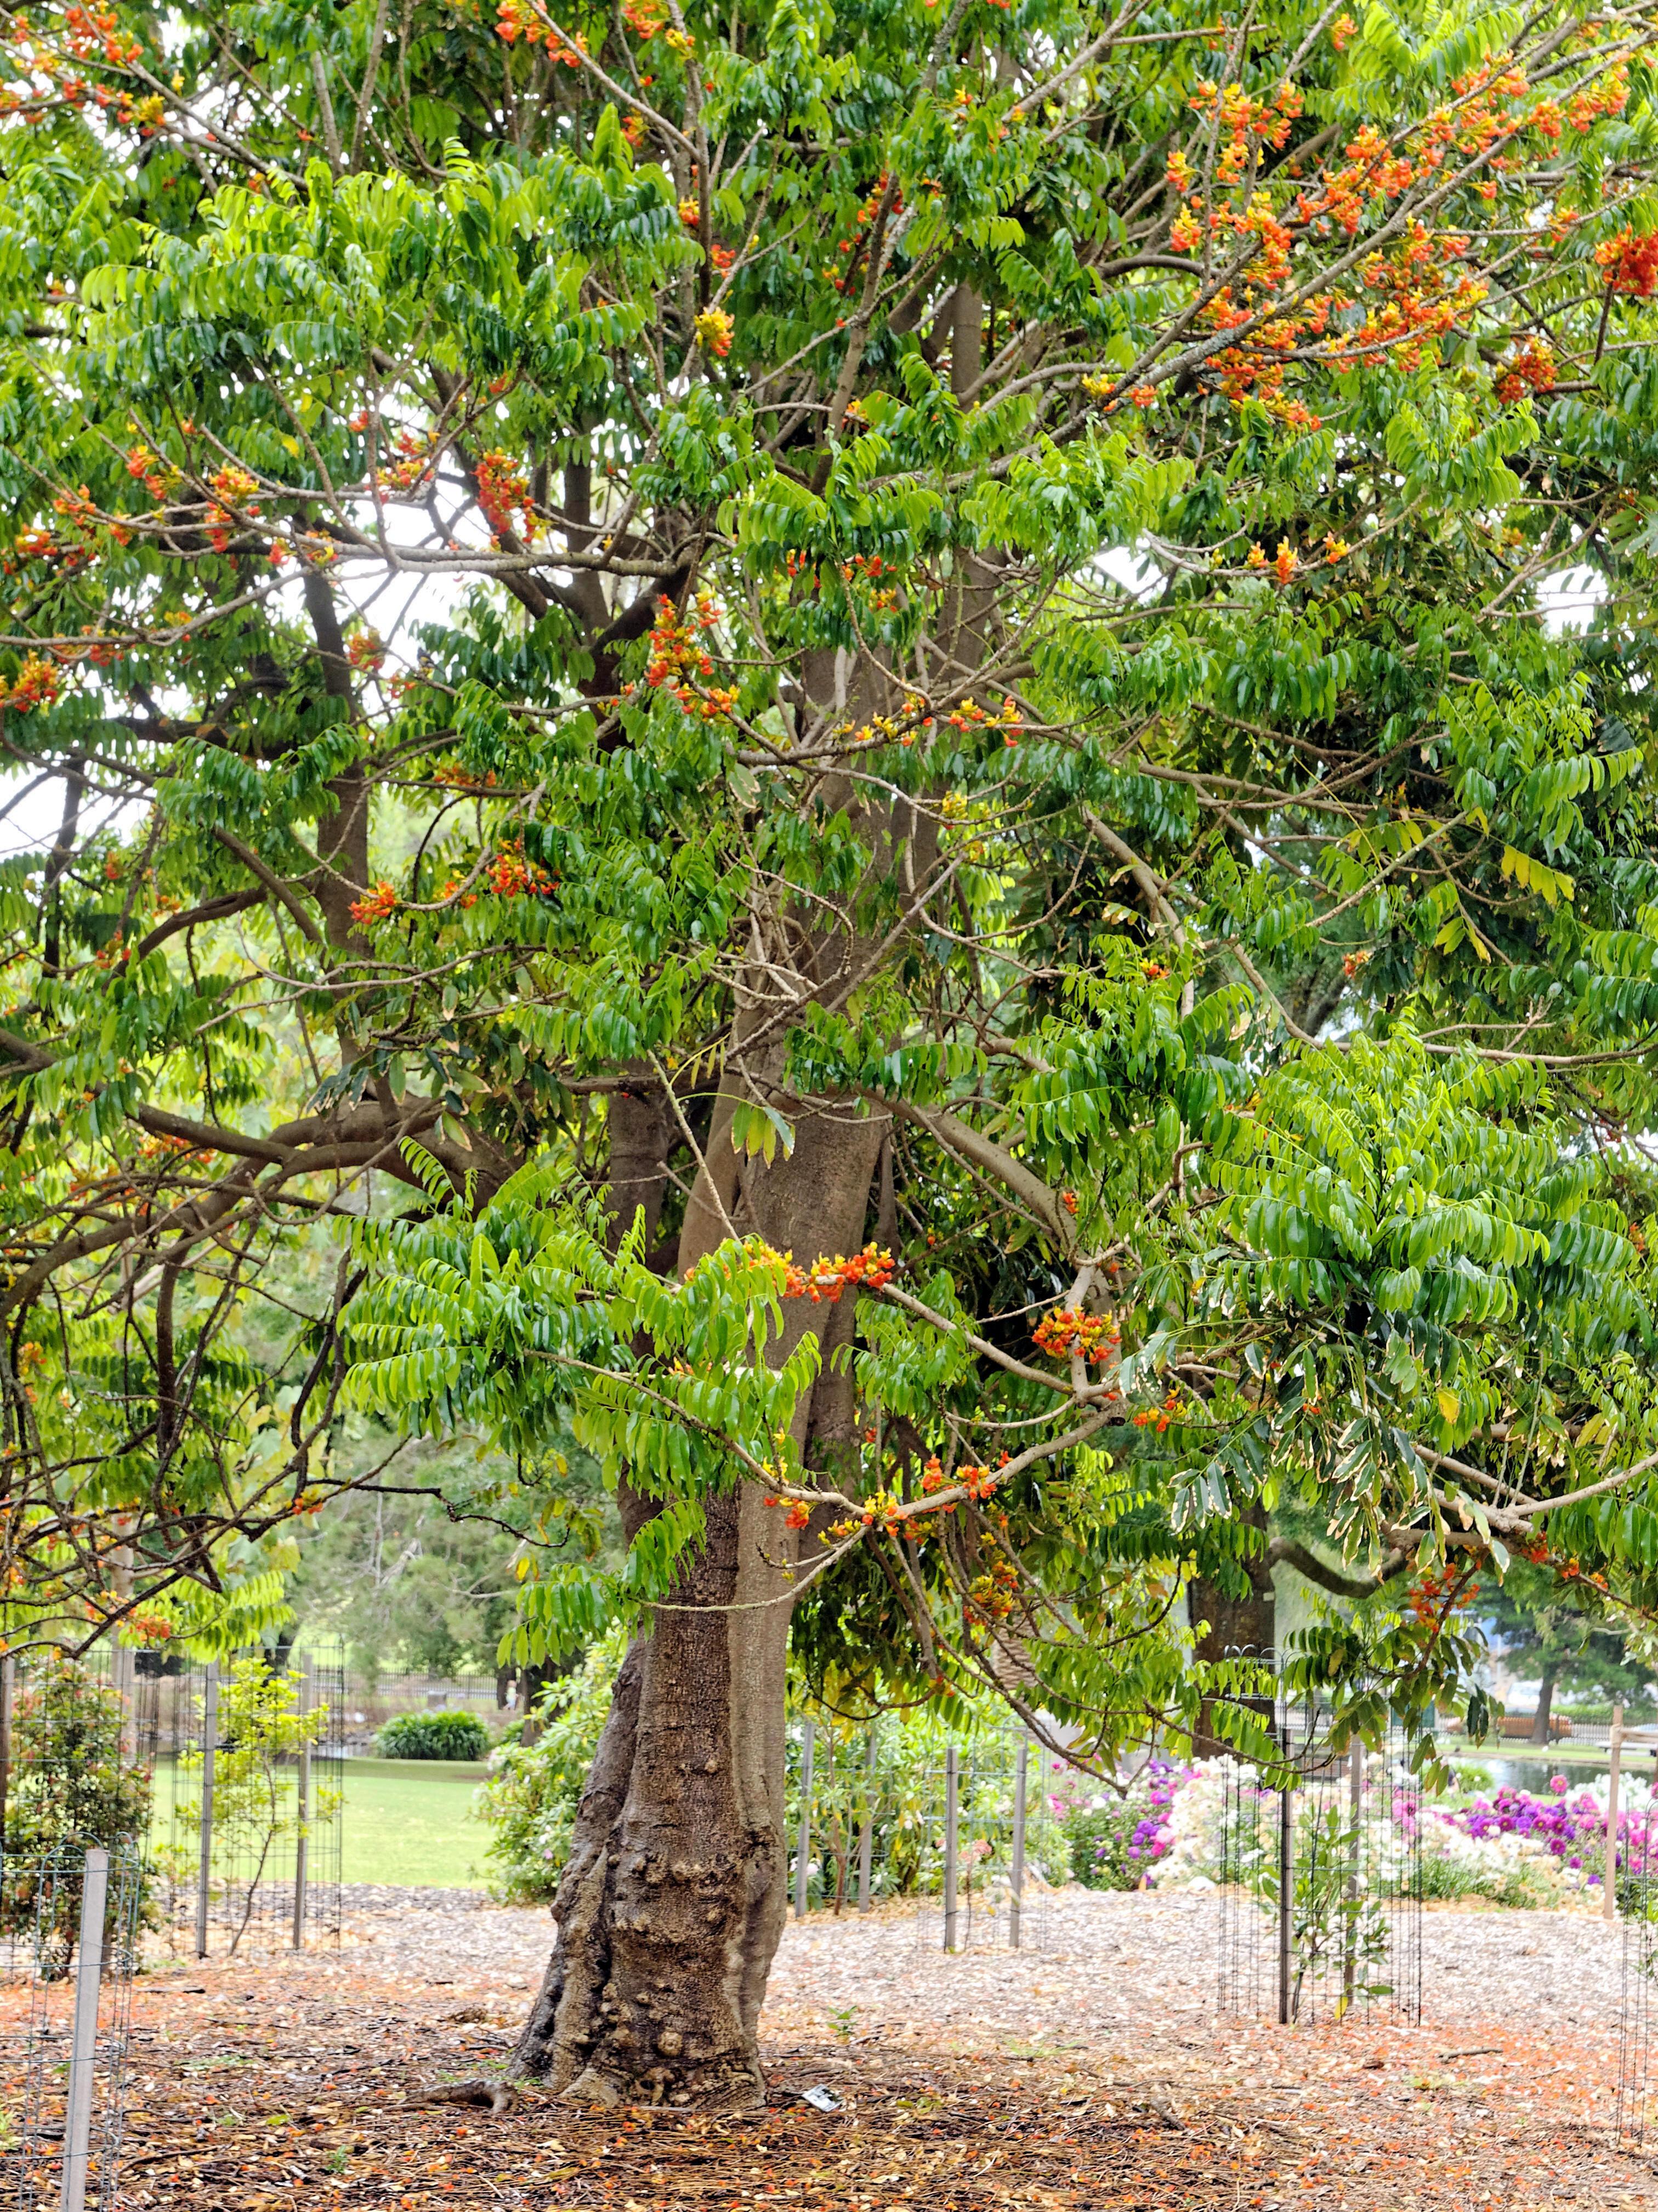 Castanospermum-australe-2.jpeg